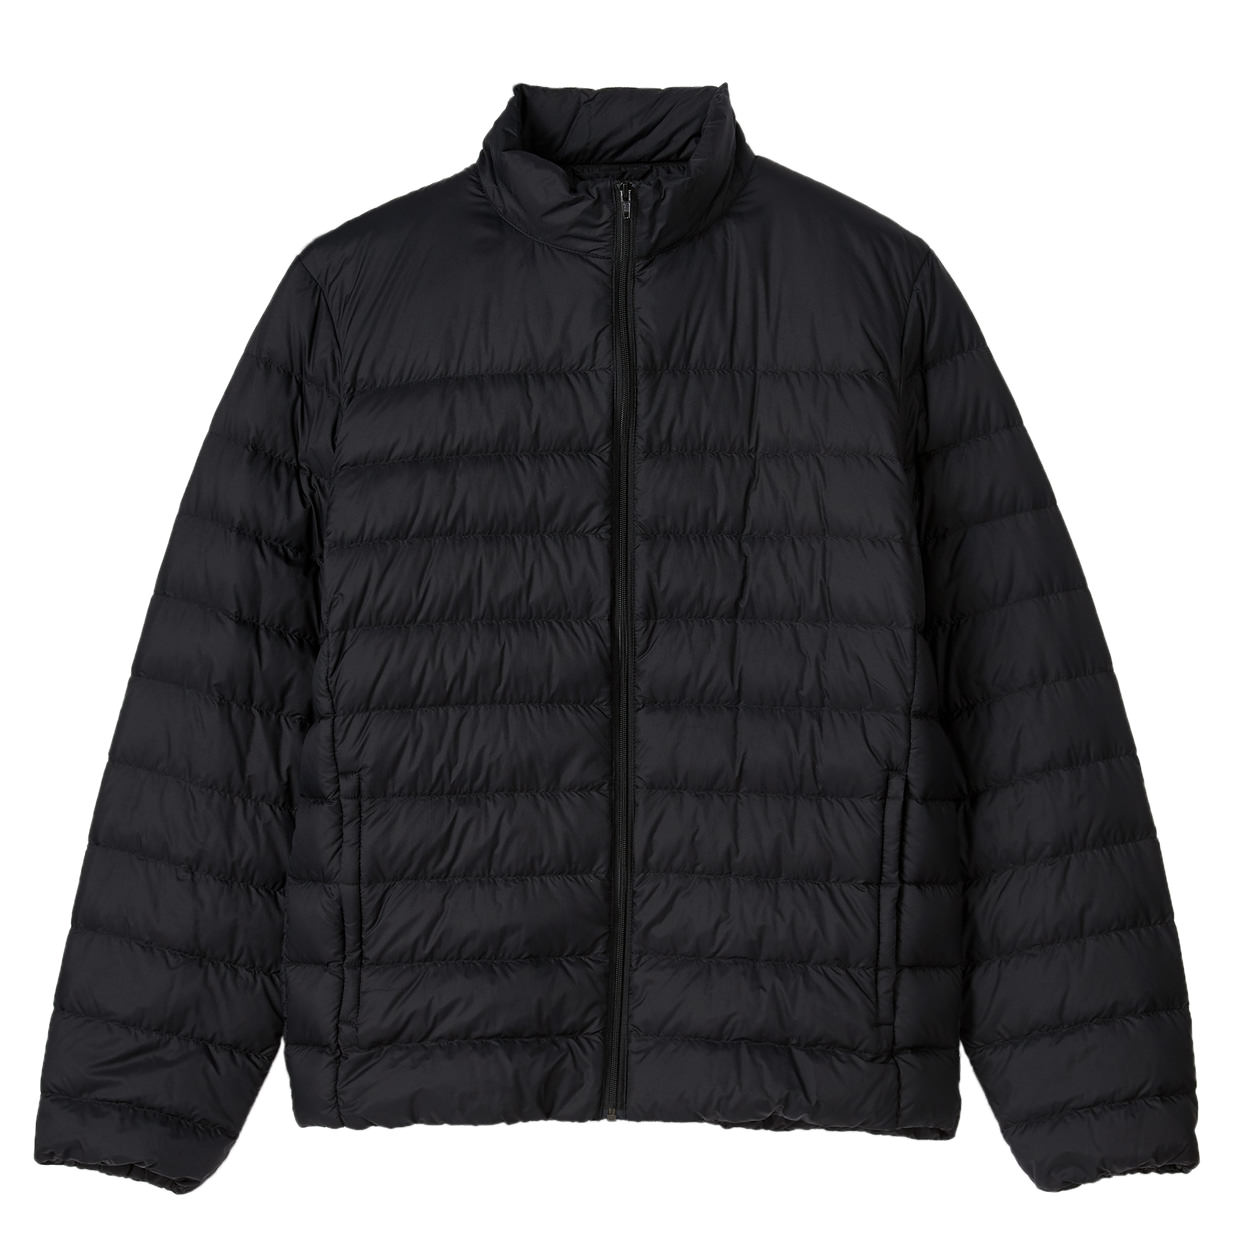 Lightweight Australian Down Pocketable Stand Collar Black U.P. $69-$99 (Less 10%)